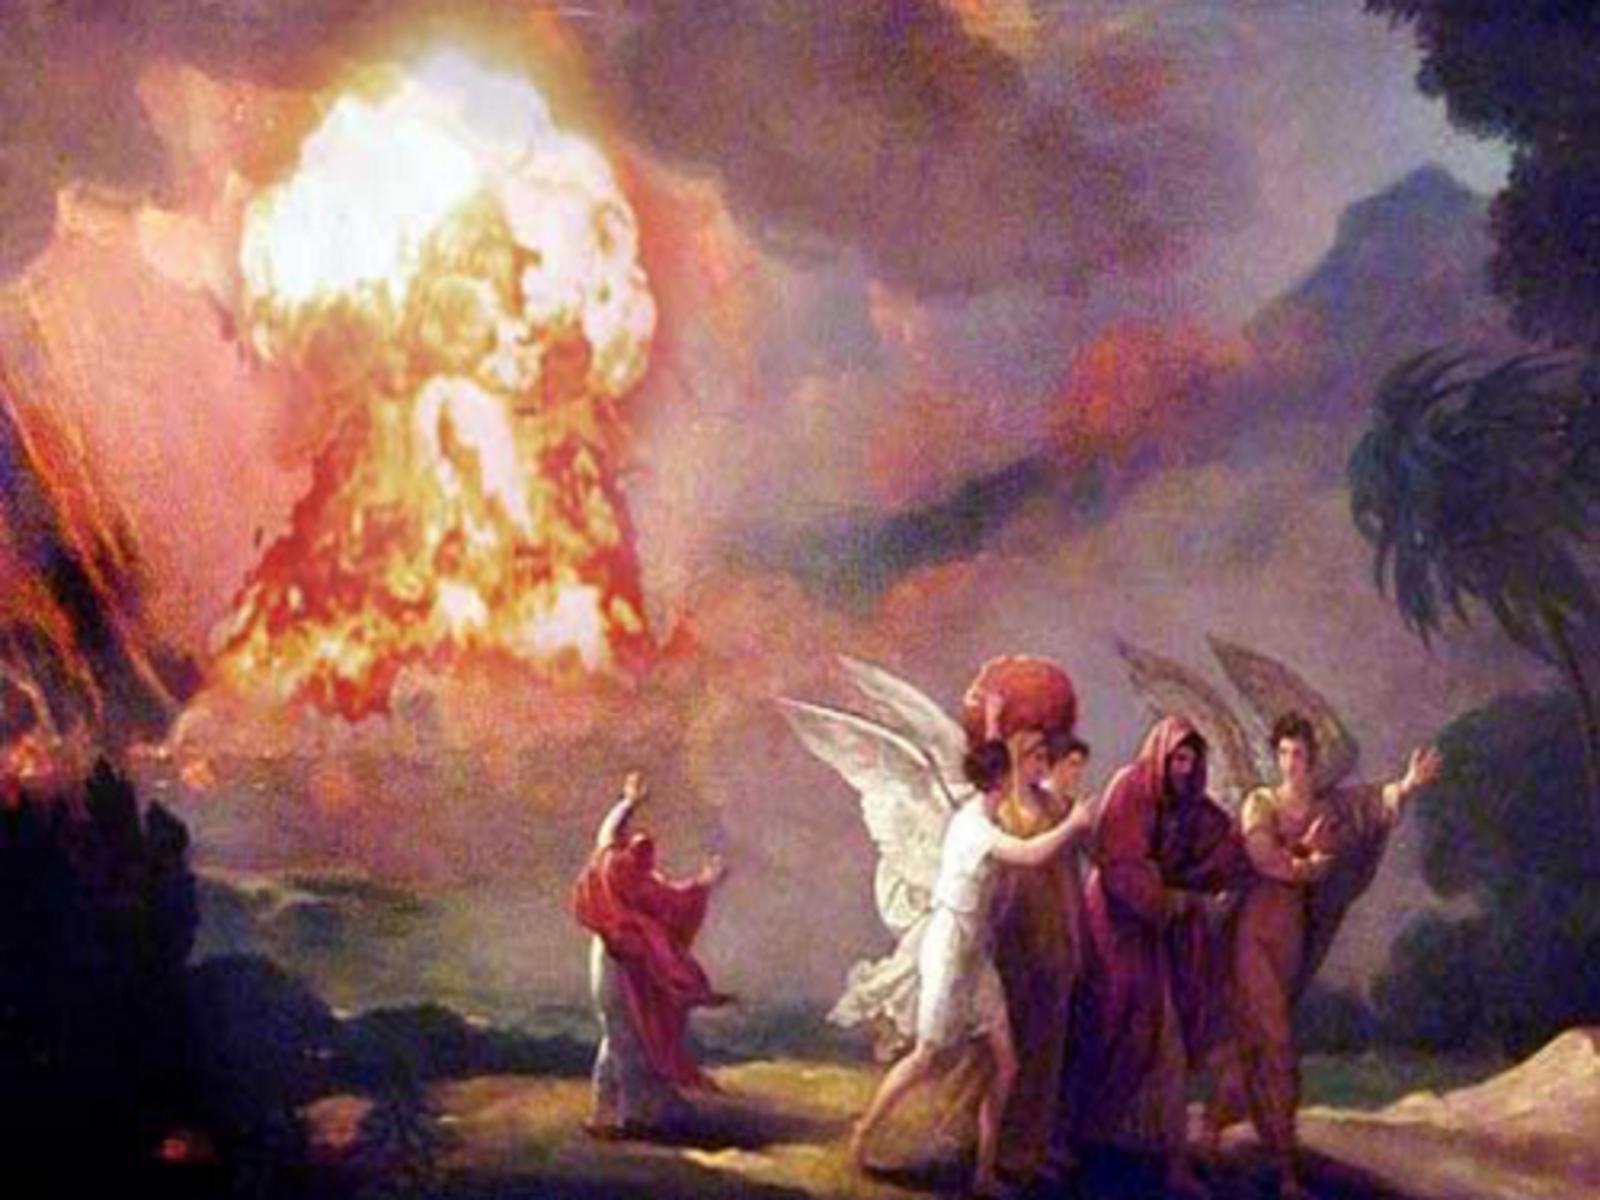 Sodom and Gomorrah by myjavier007 on deviantART